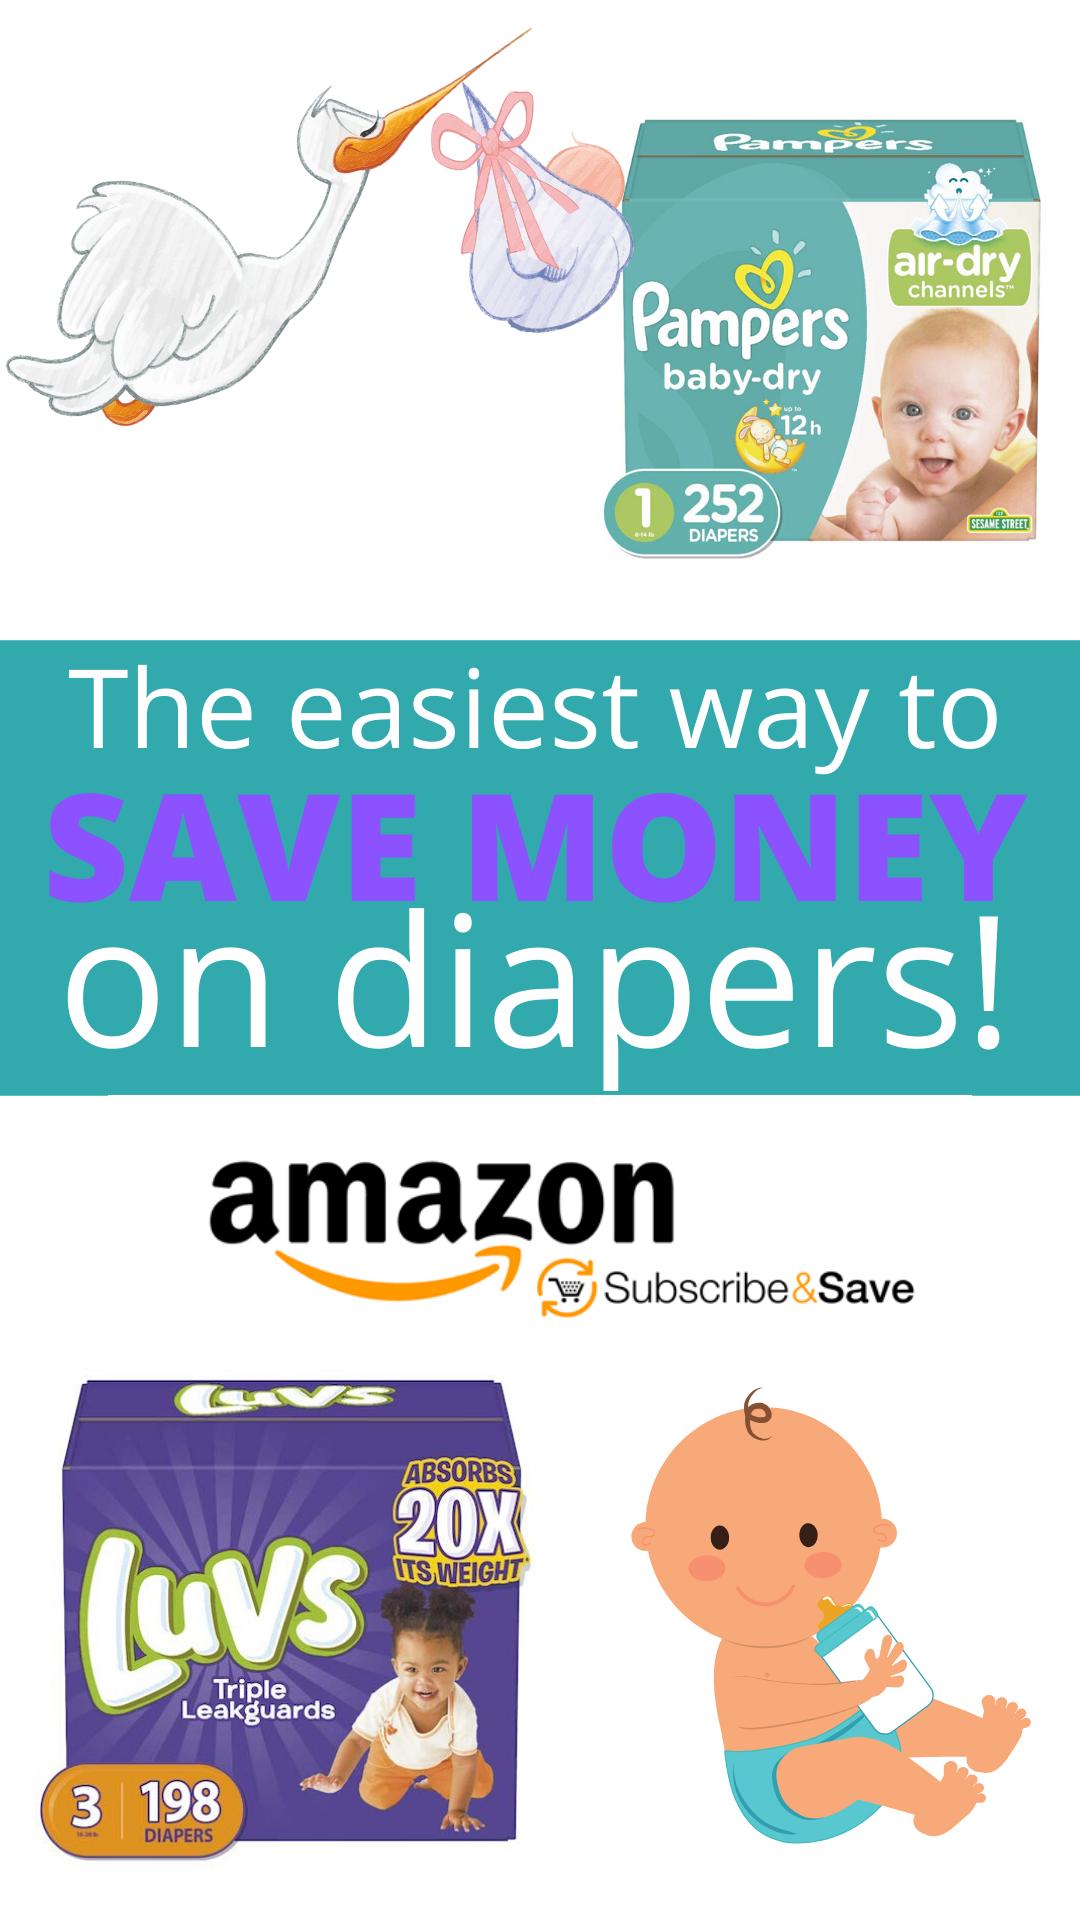 Amazon diaper deals - Save money on Diapers